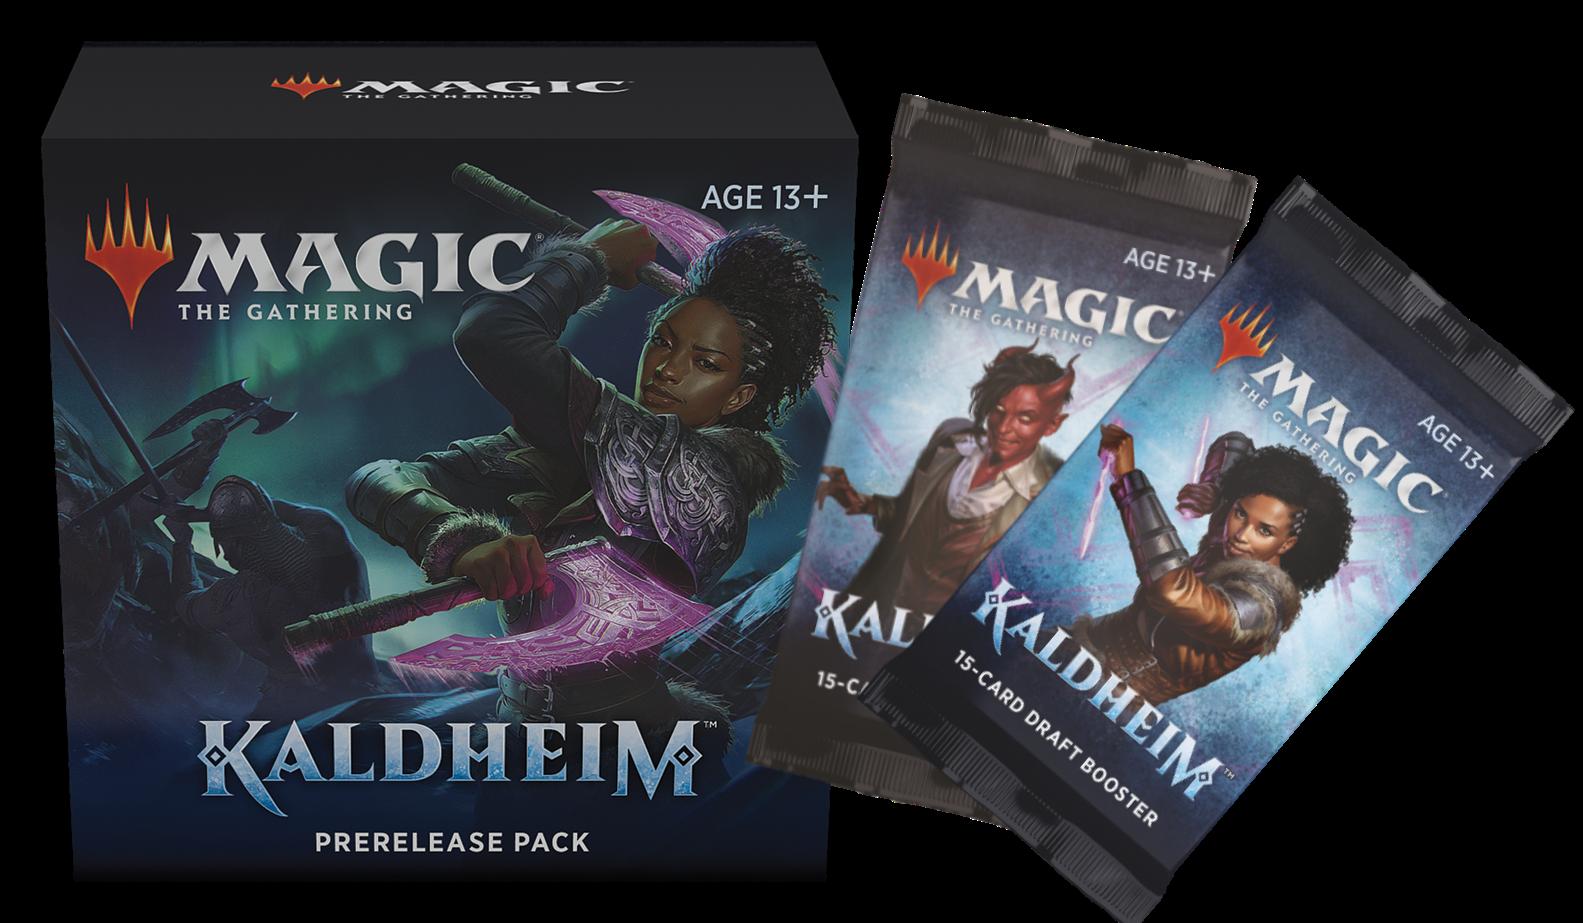 Kaldheim Prerelease Pack + 2 Kaldheim Prize Boosters